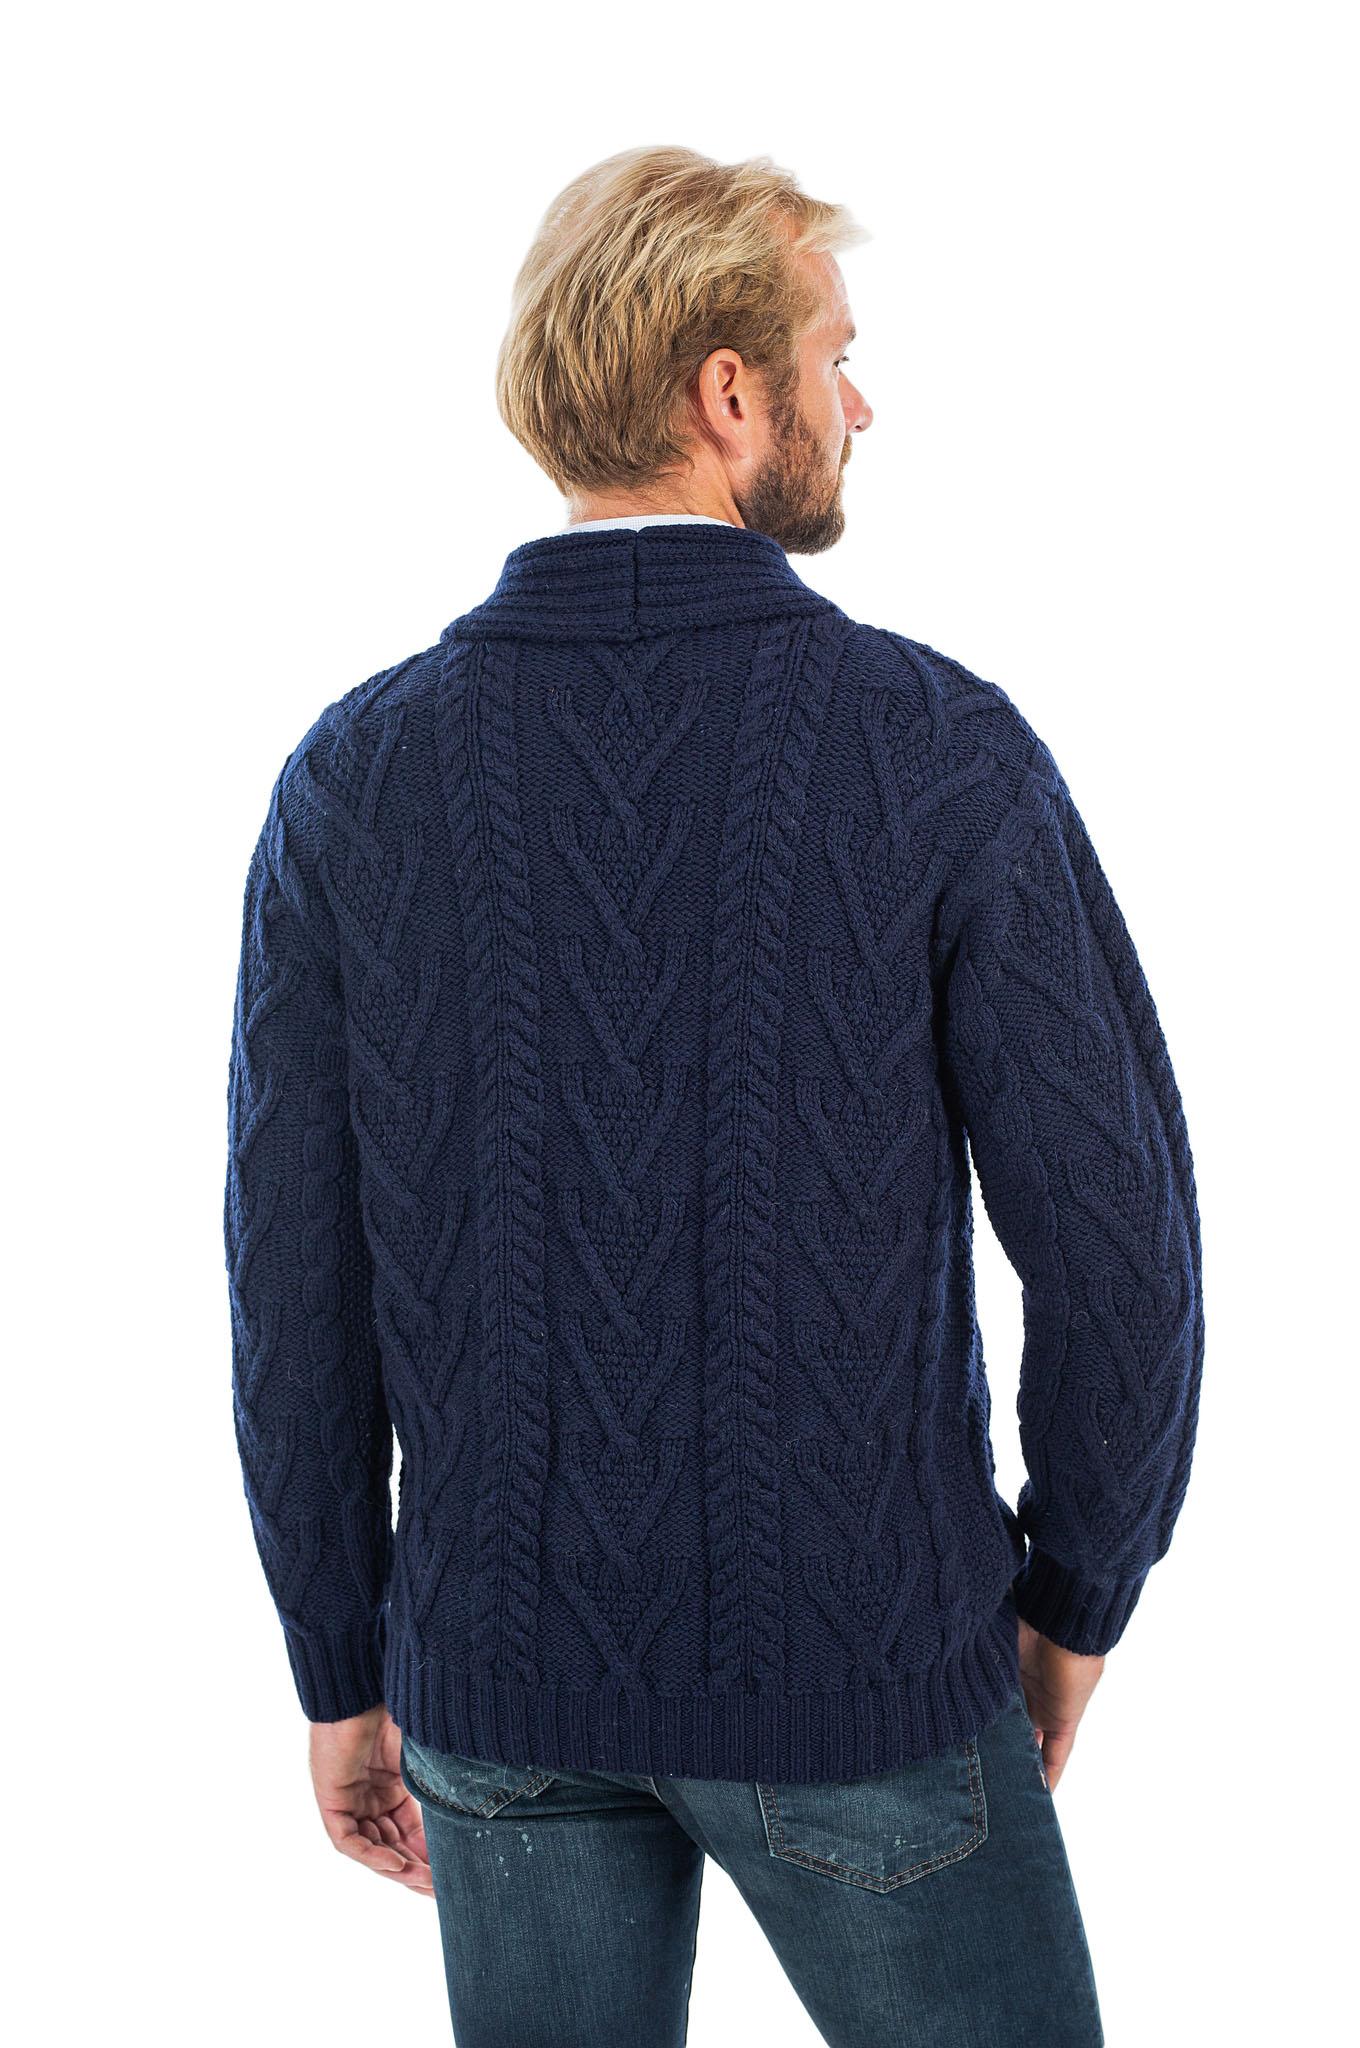 SAOL-Mens-Irish-Merino-Wool-Cardigan-Shawl-Collar-Front-Pockets-Aran-Cable-Knit thumbnail 21